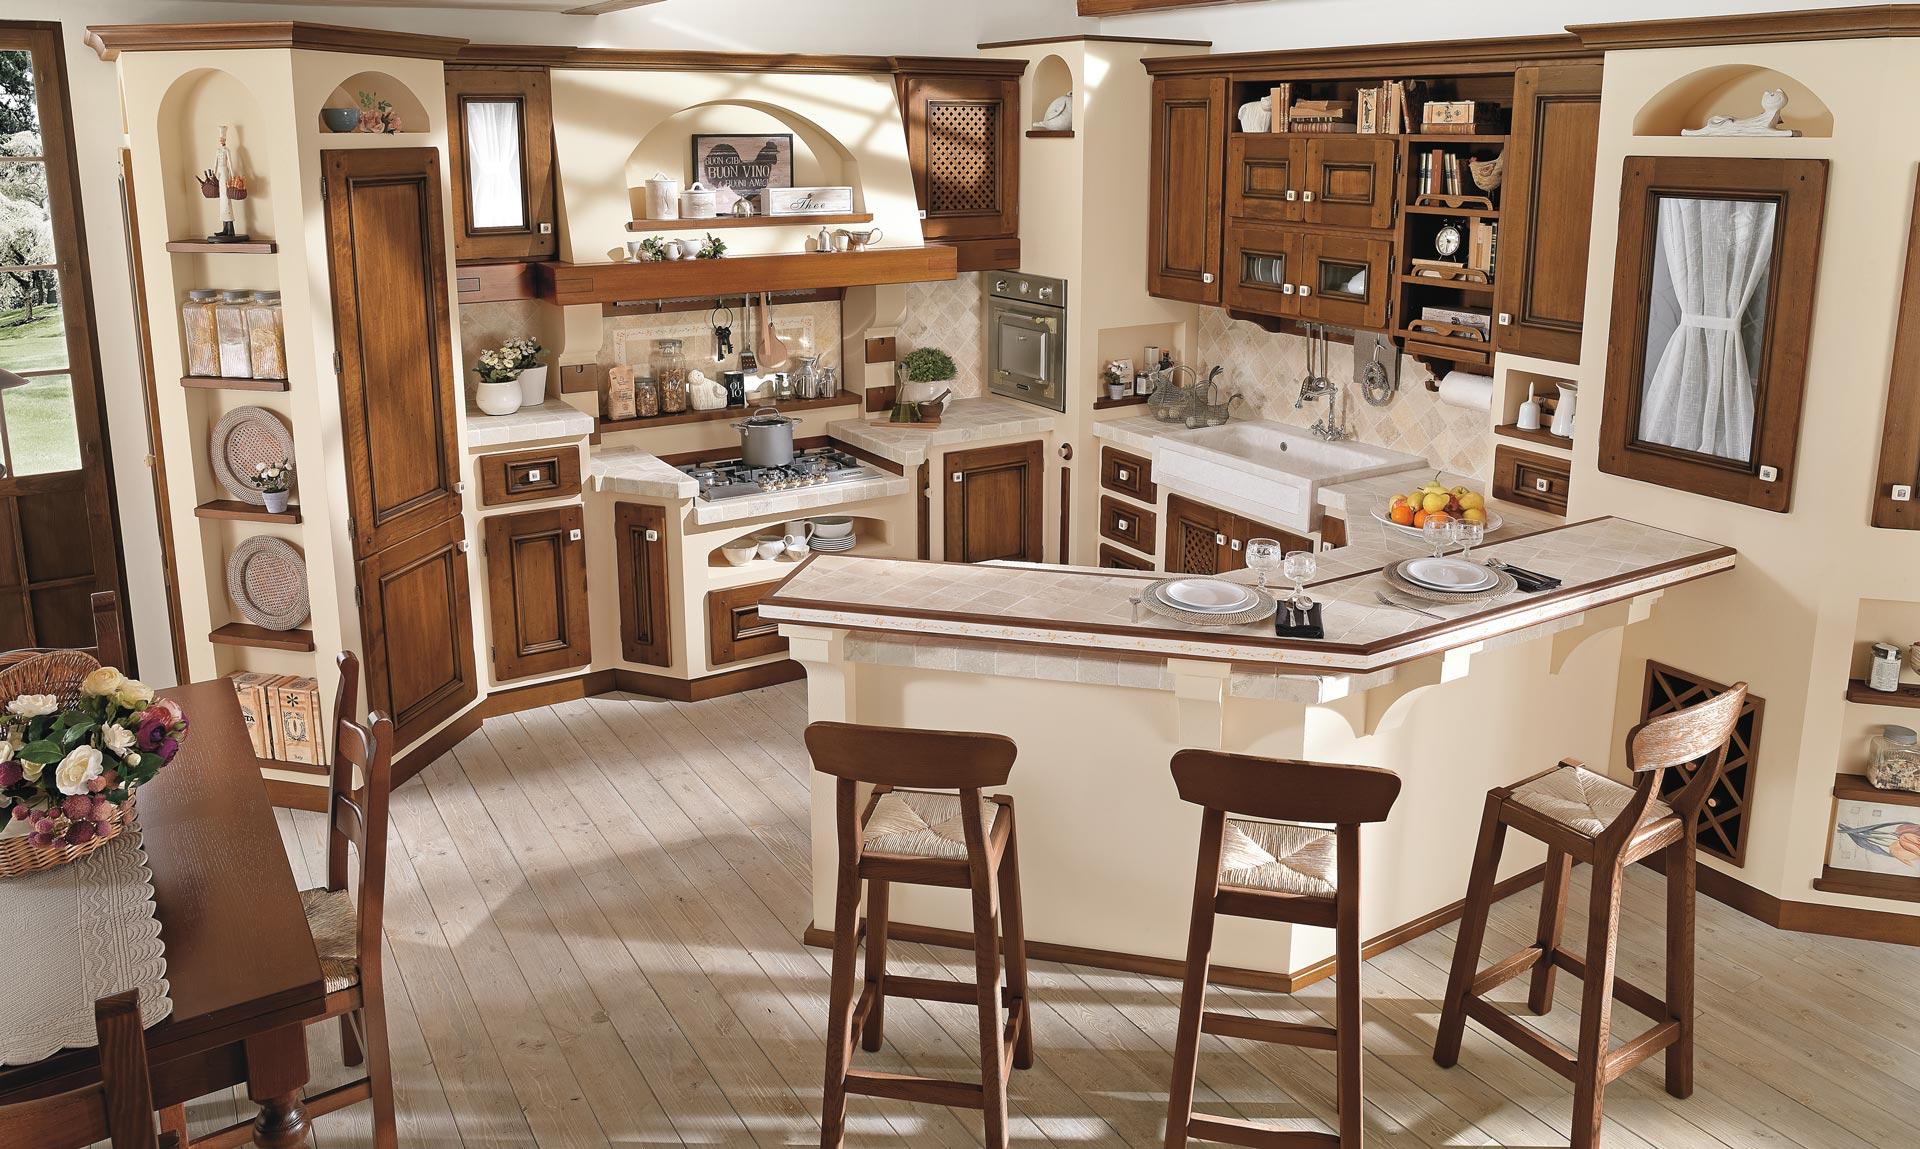 Stunning Cucine Antiche In Muratura Images - Home Design - joygree.info